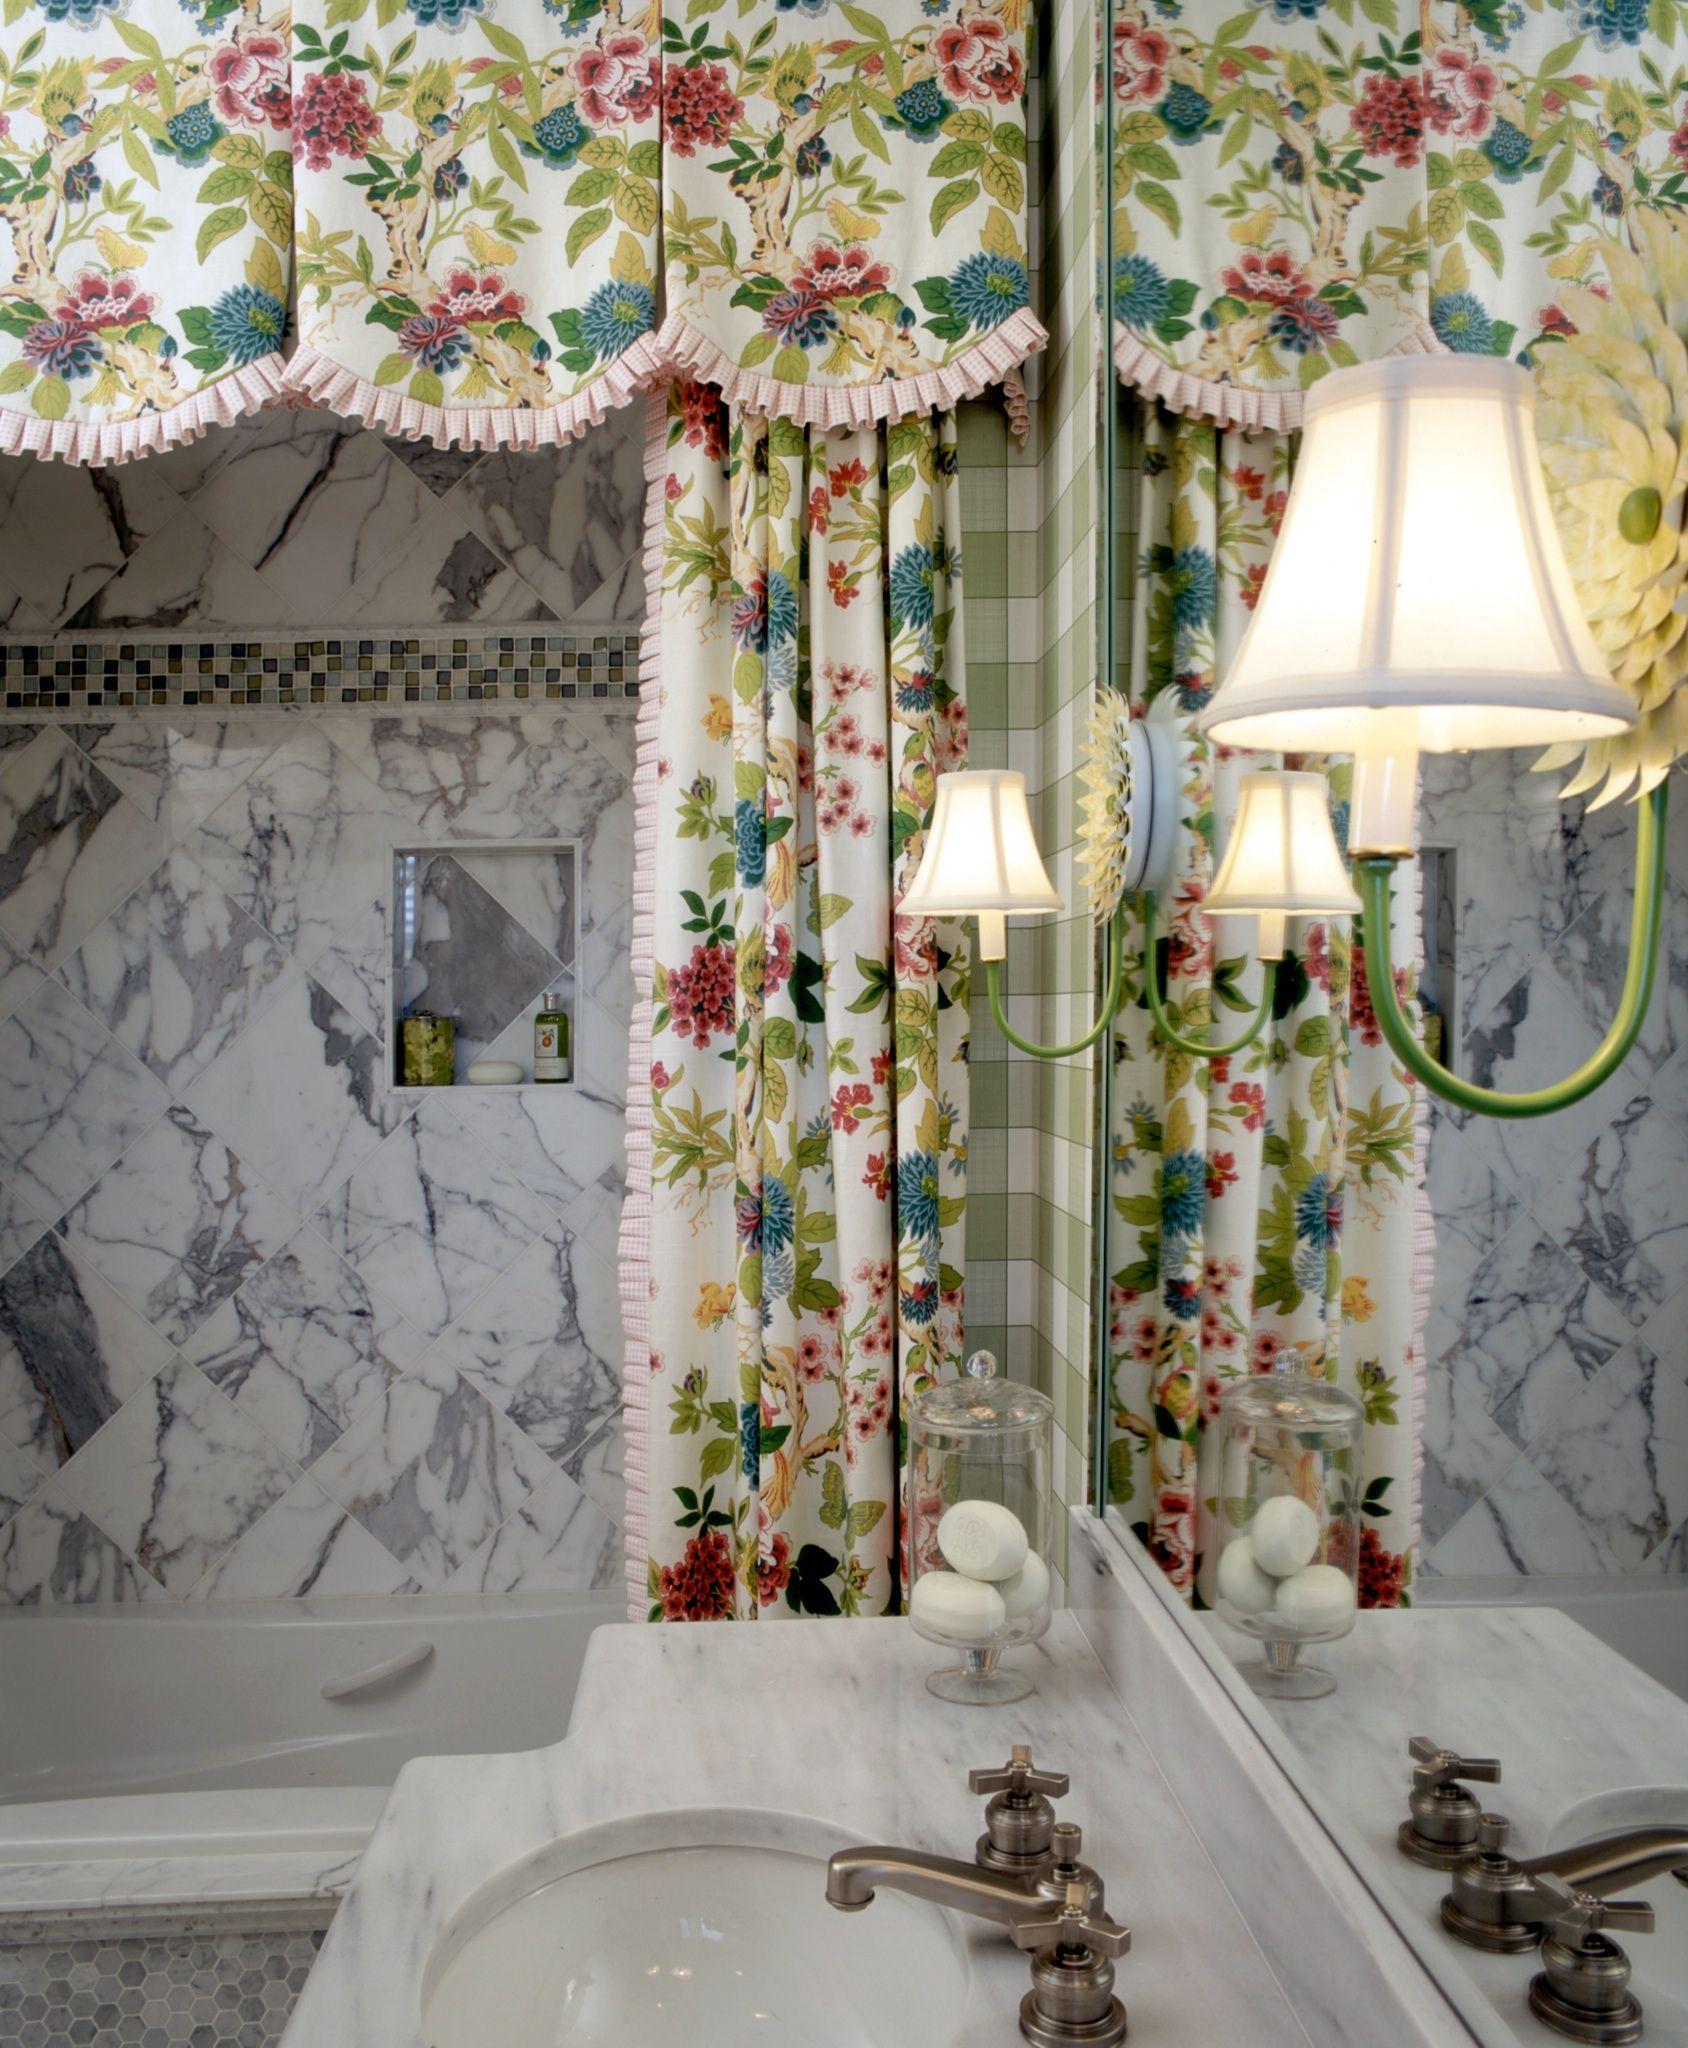 Elegant And Family Friendly Atlanta Home: Lilly Pulitzer Bathroom By Parker Kennedy Living Atlanta